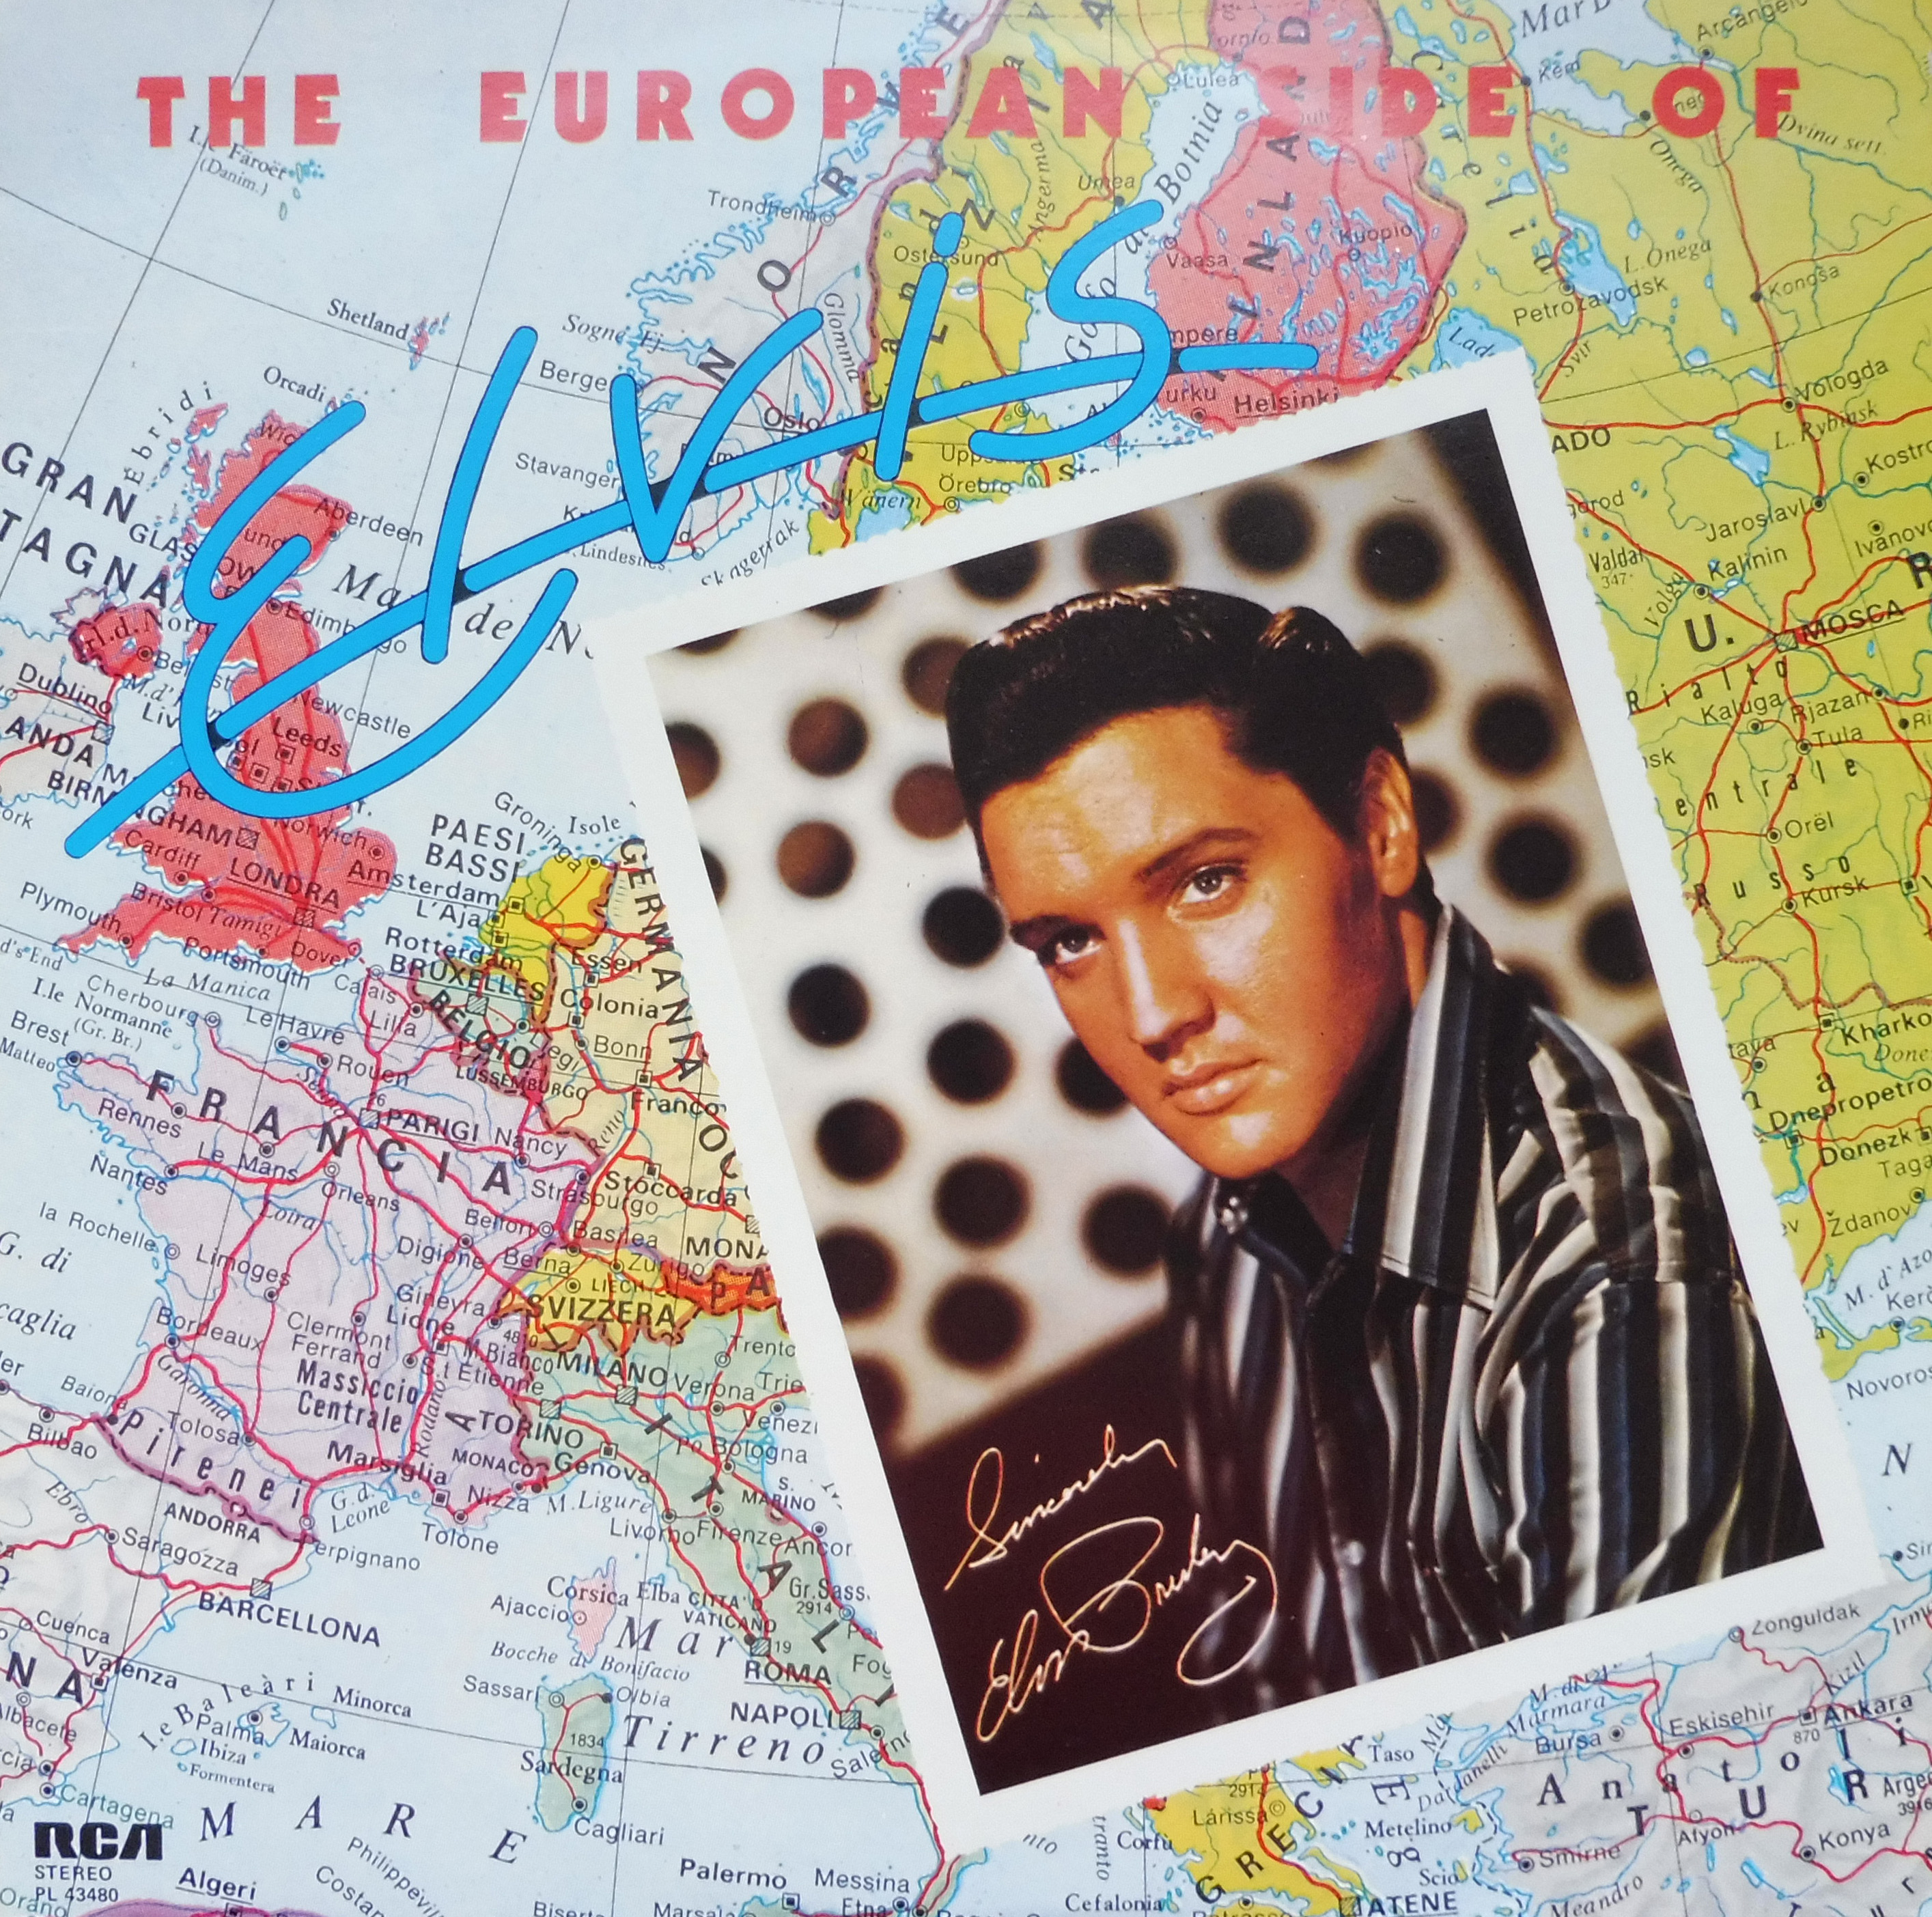 THE EUROPEAN SIDE OF ELVIS Europeansideittanfroneofhd